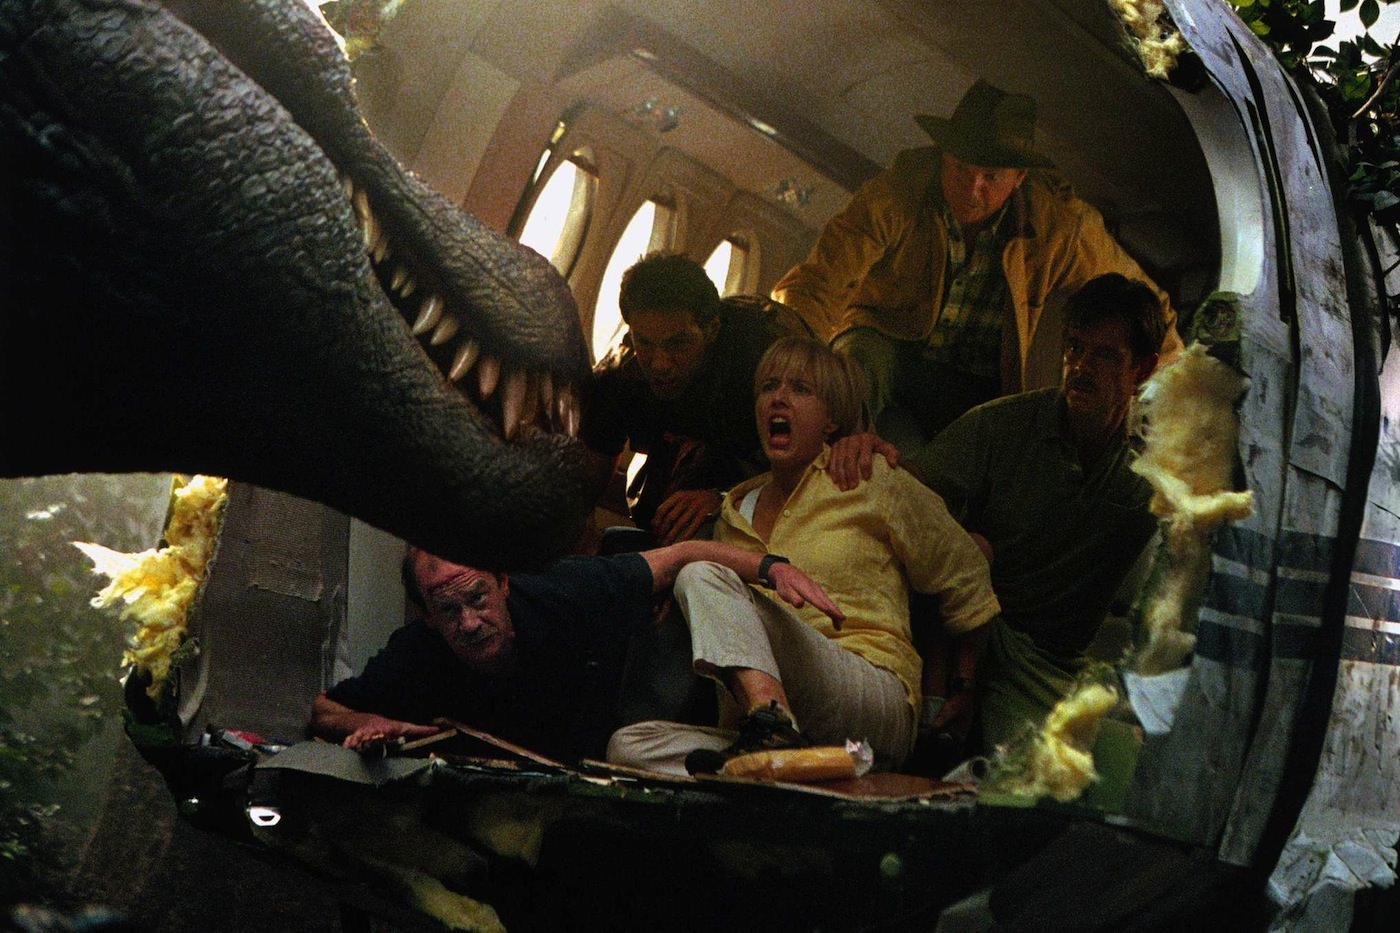 Jurassic park III joe johnston